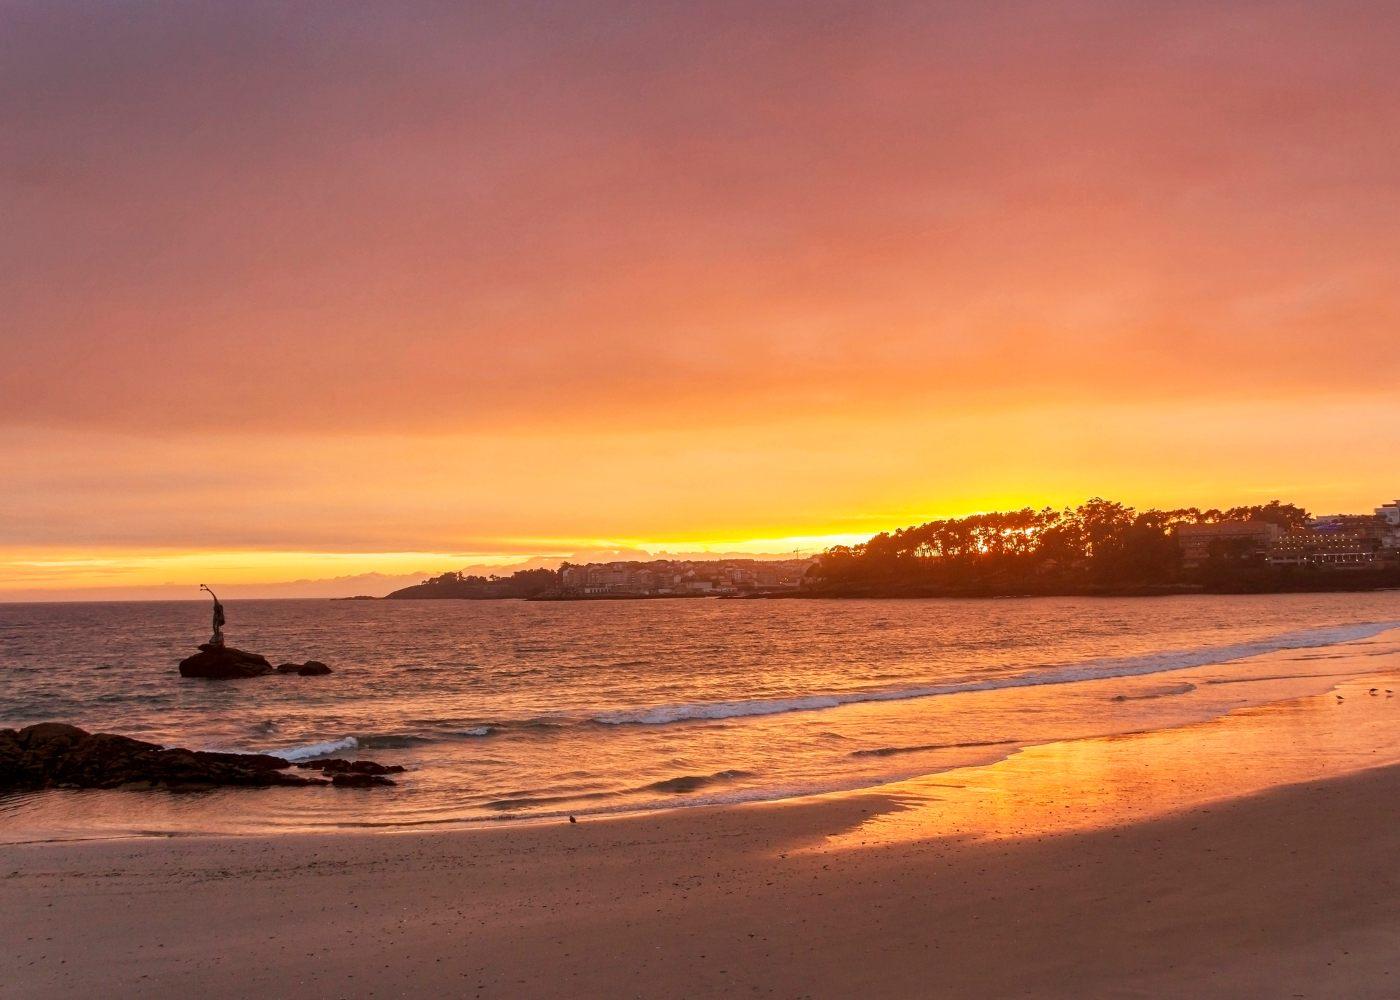 Pôr do sol em Sanxenxo